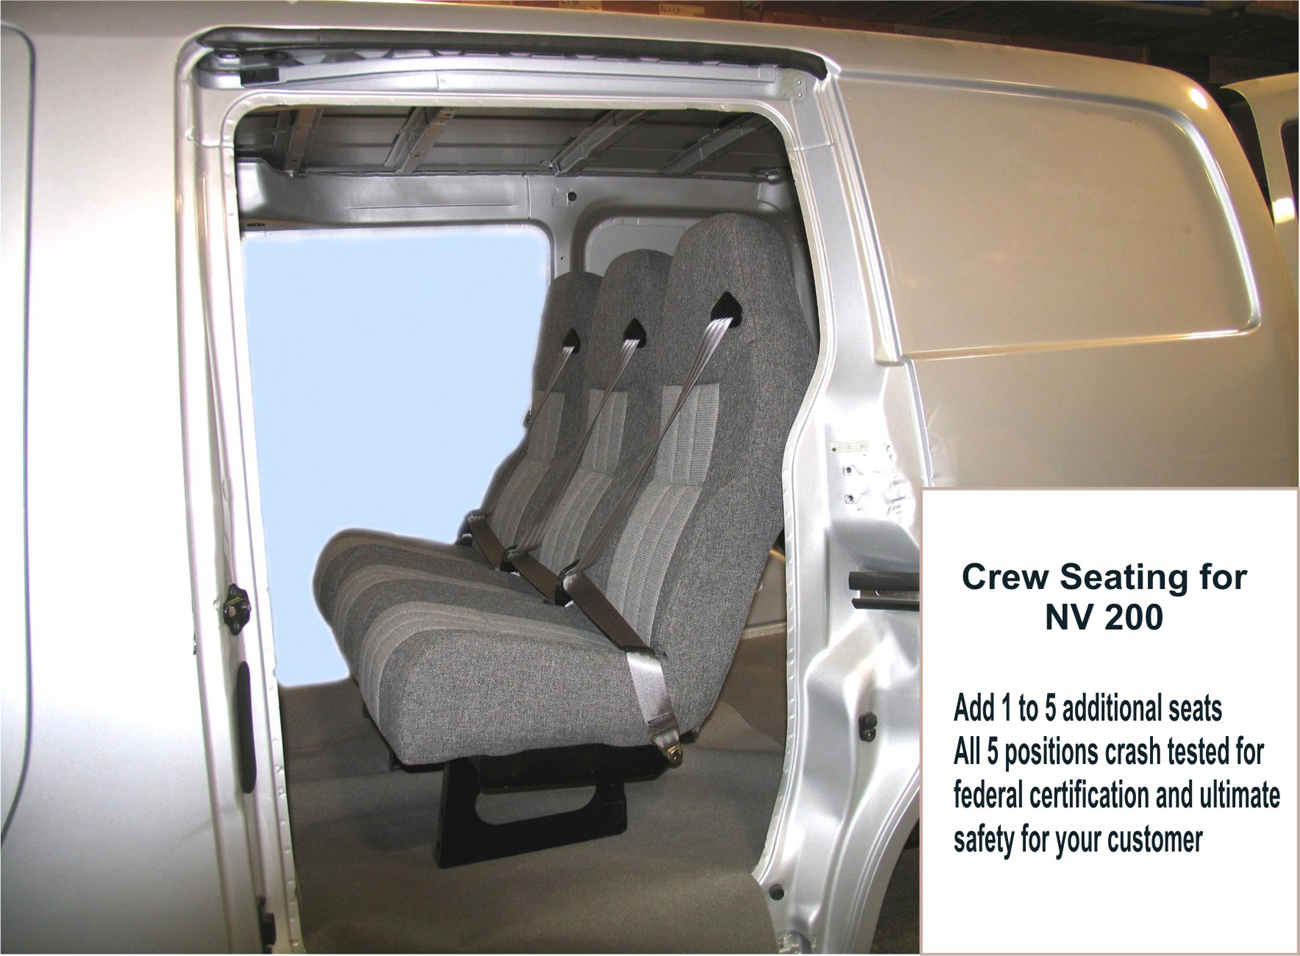 Nissan Nv Passenger >> Nissan Custom Vans - Customizers Quality Conversions